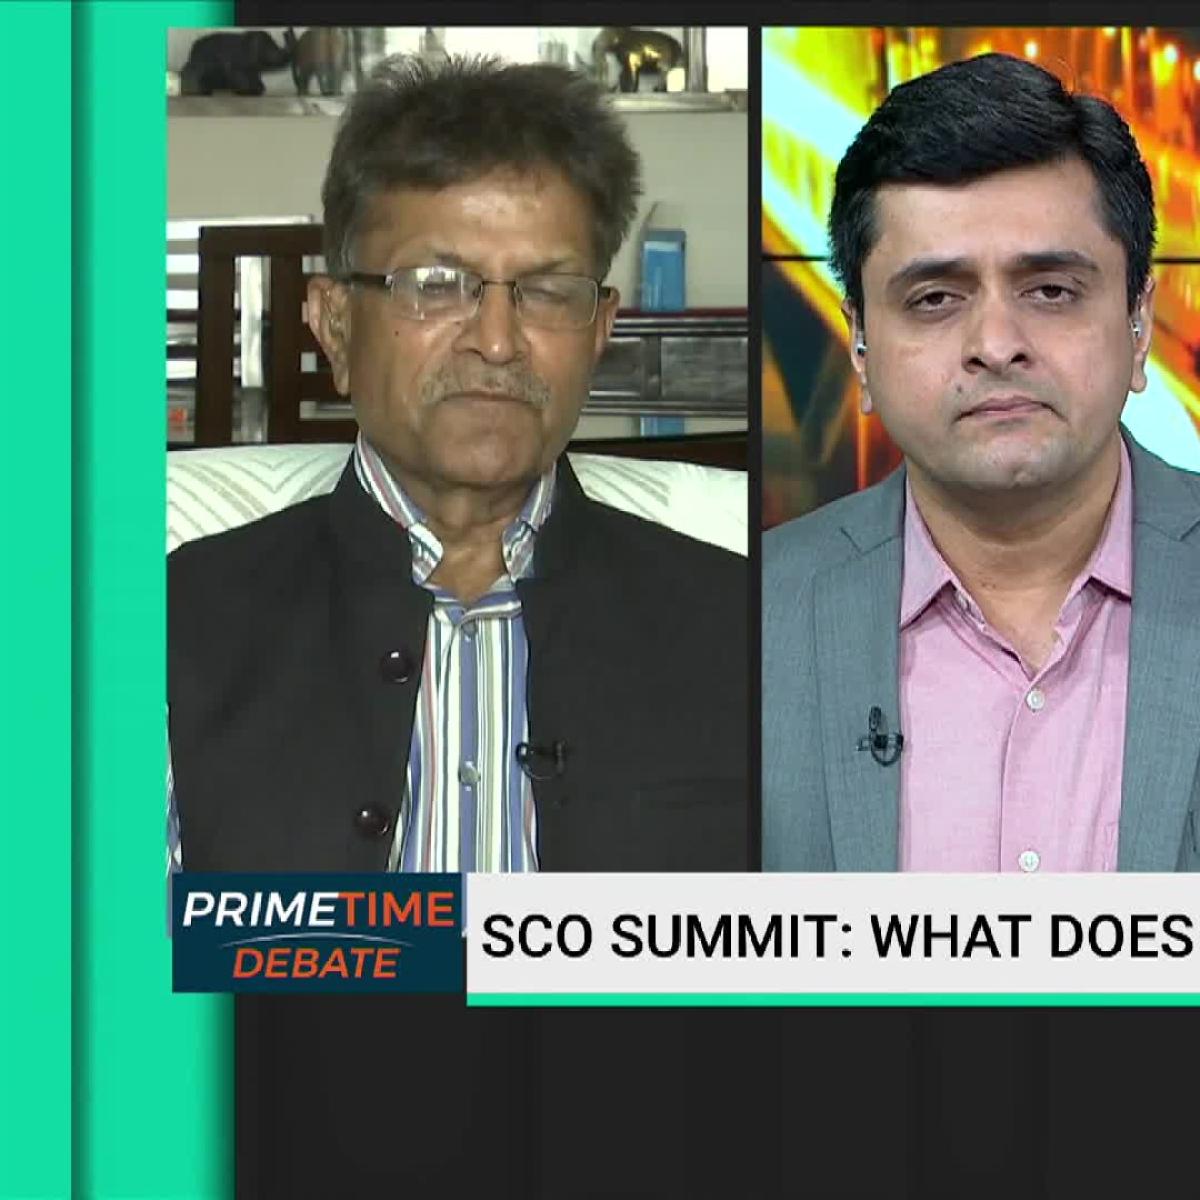 SCO Summit: What Will India's Priorities Be?